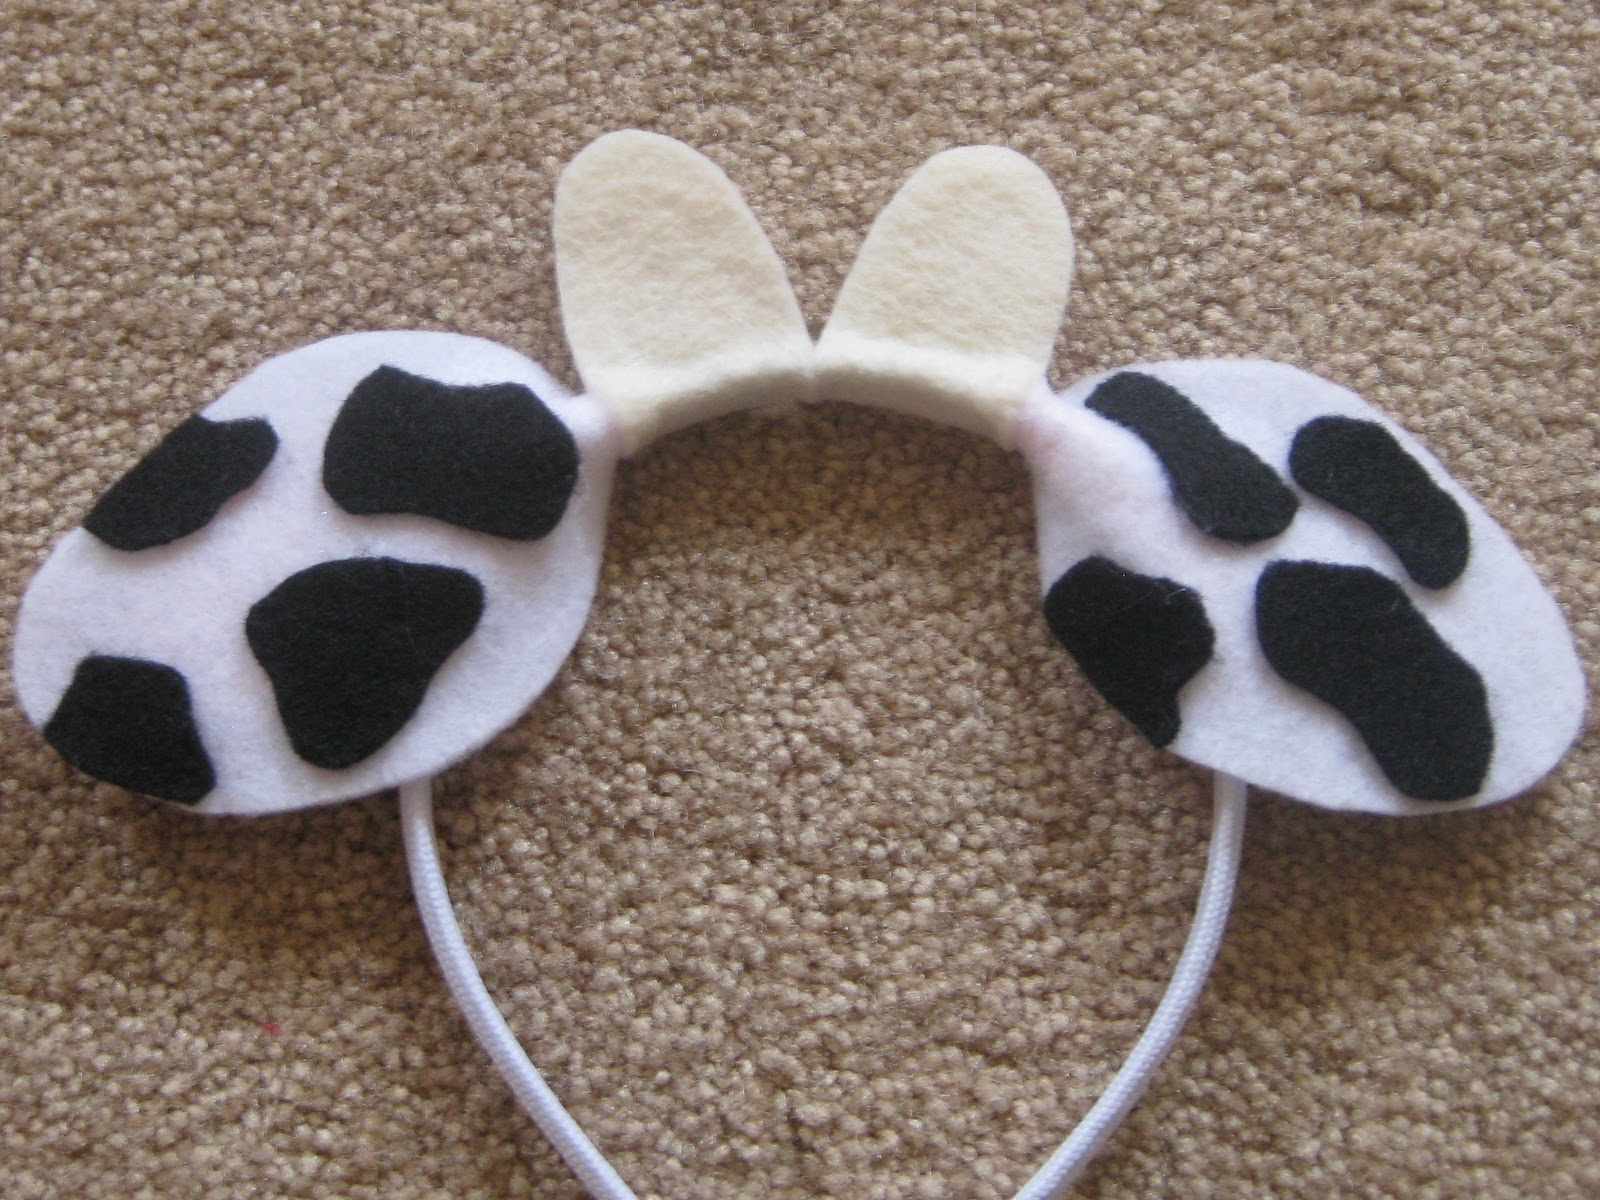 graphic relating to Cow Ears Printable titled Ashleys Craft Corner: Animal Ears Headbands